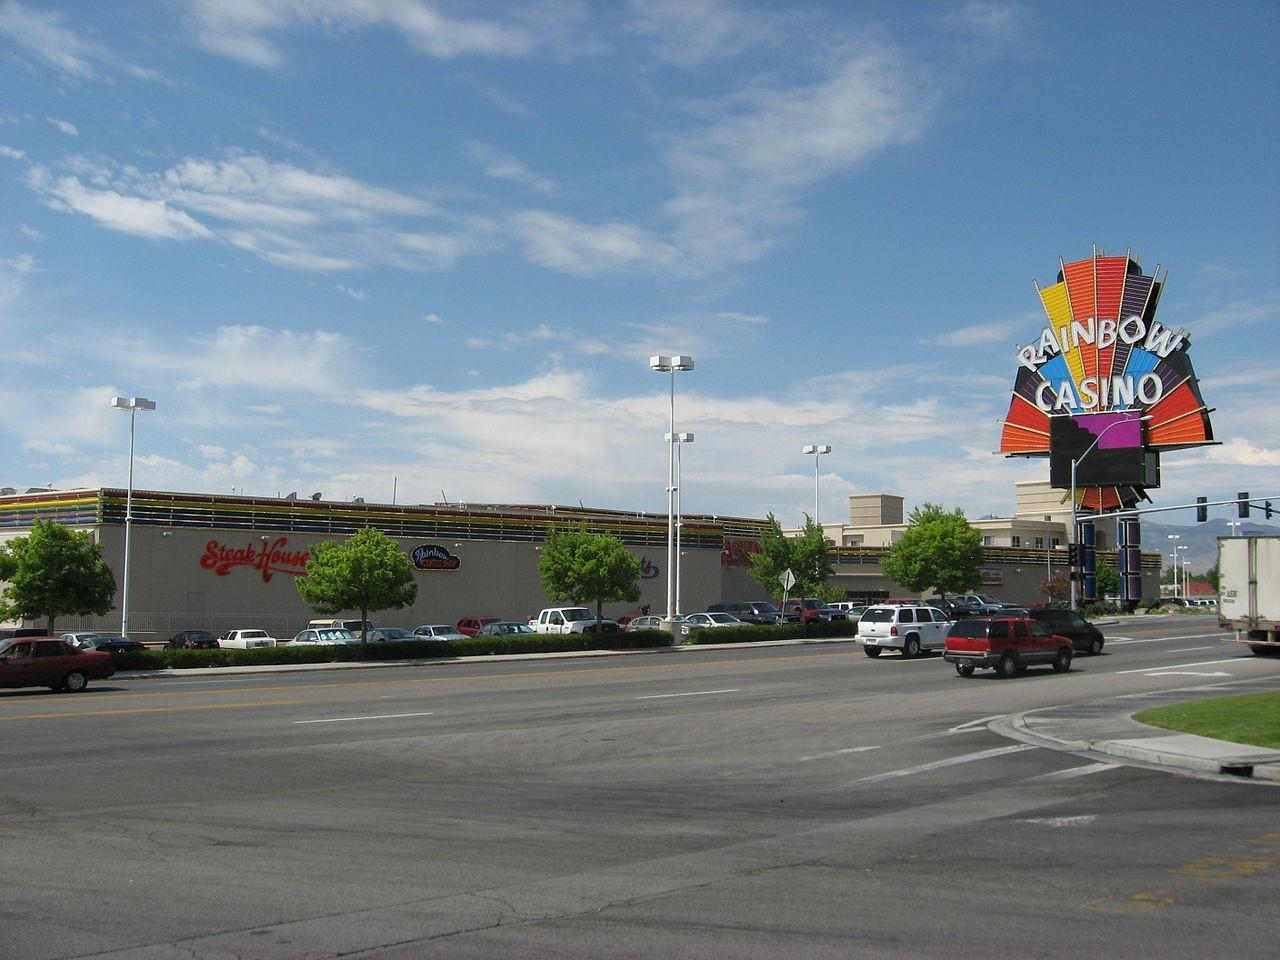 Rainbow Hotel & Casino